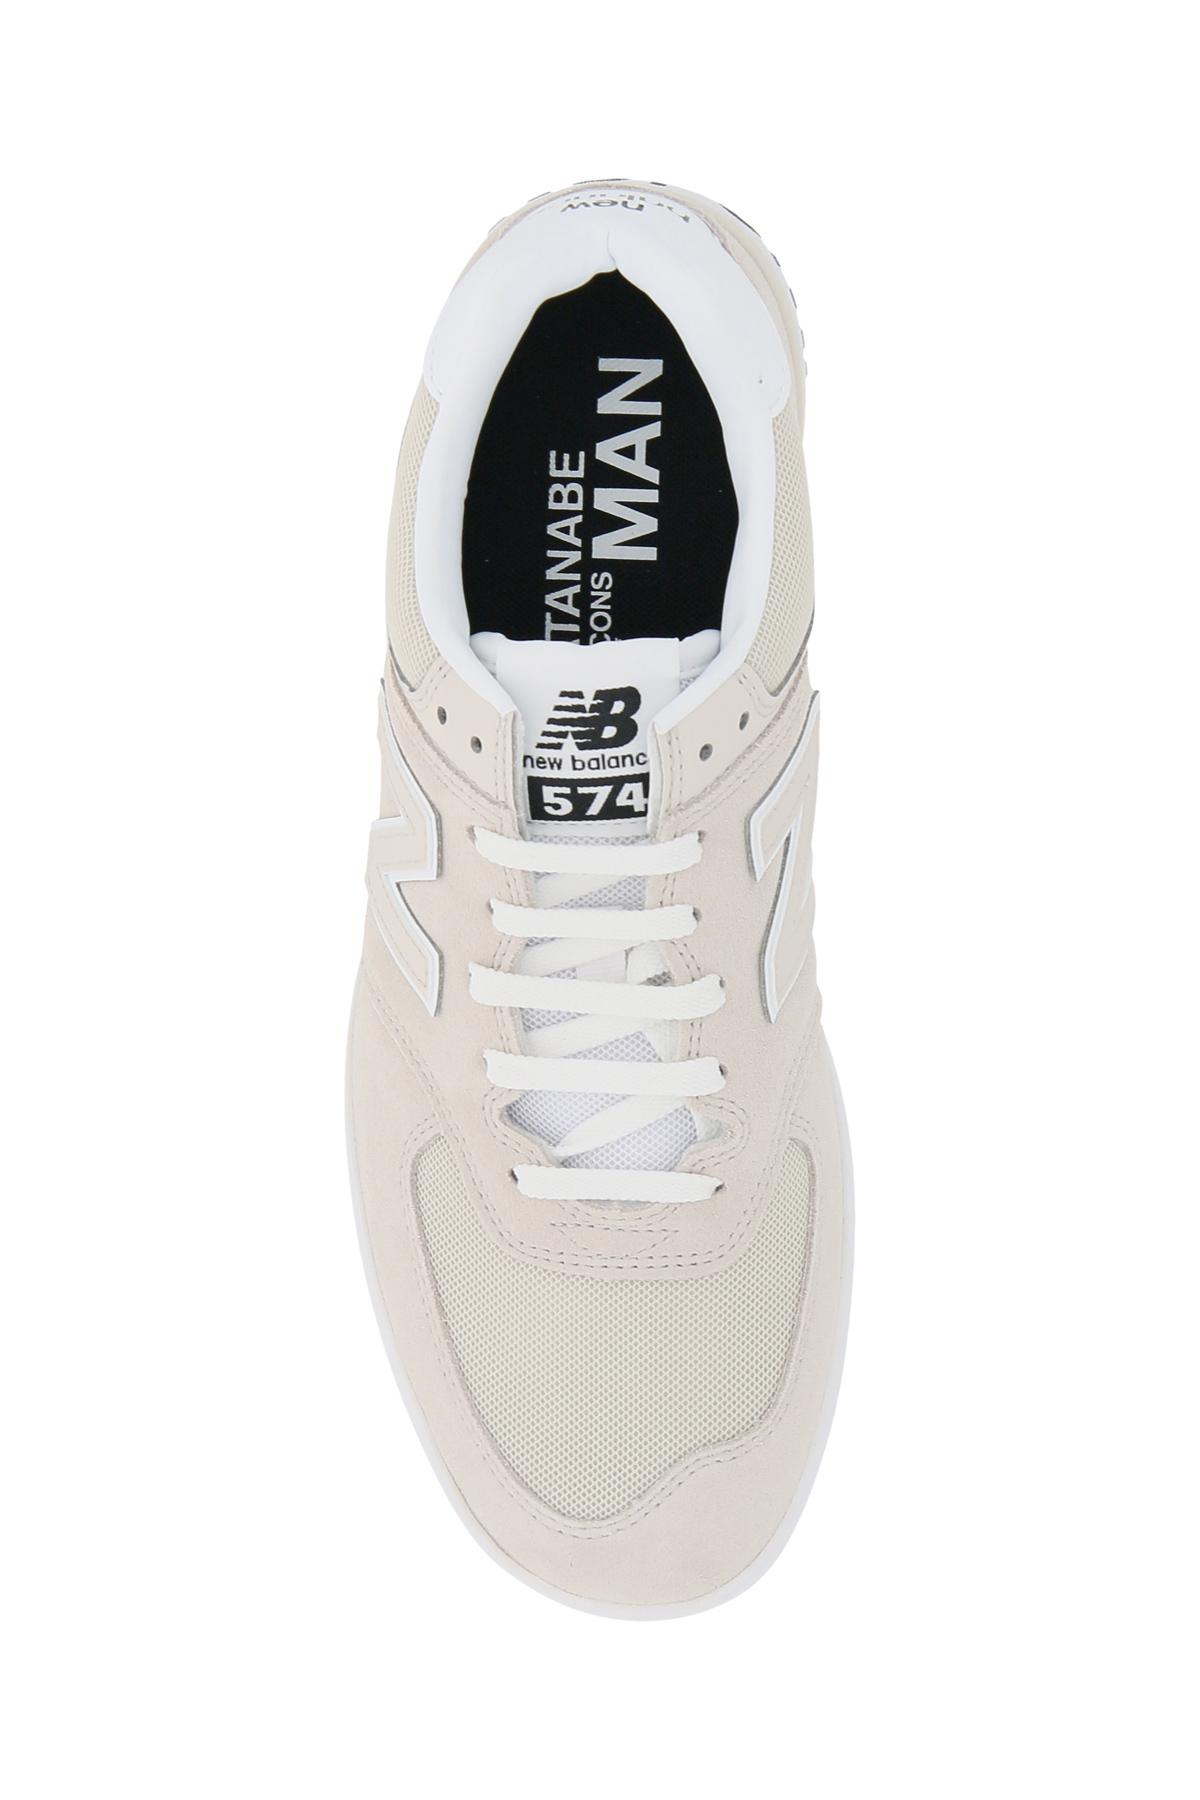 Junya watanabe sneakers 574 junya watanabe x new balance